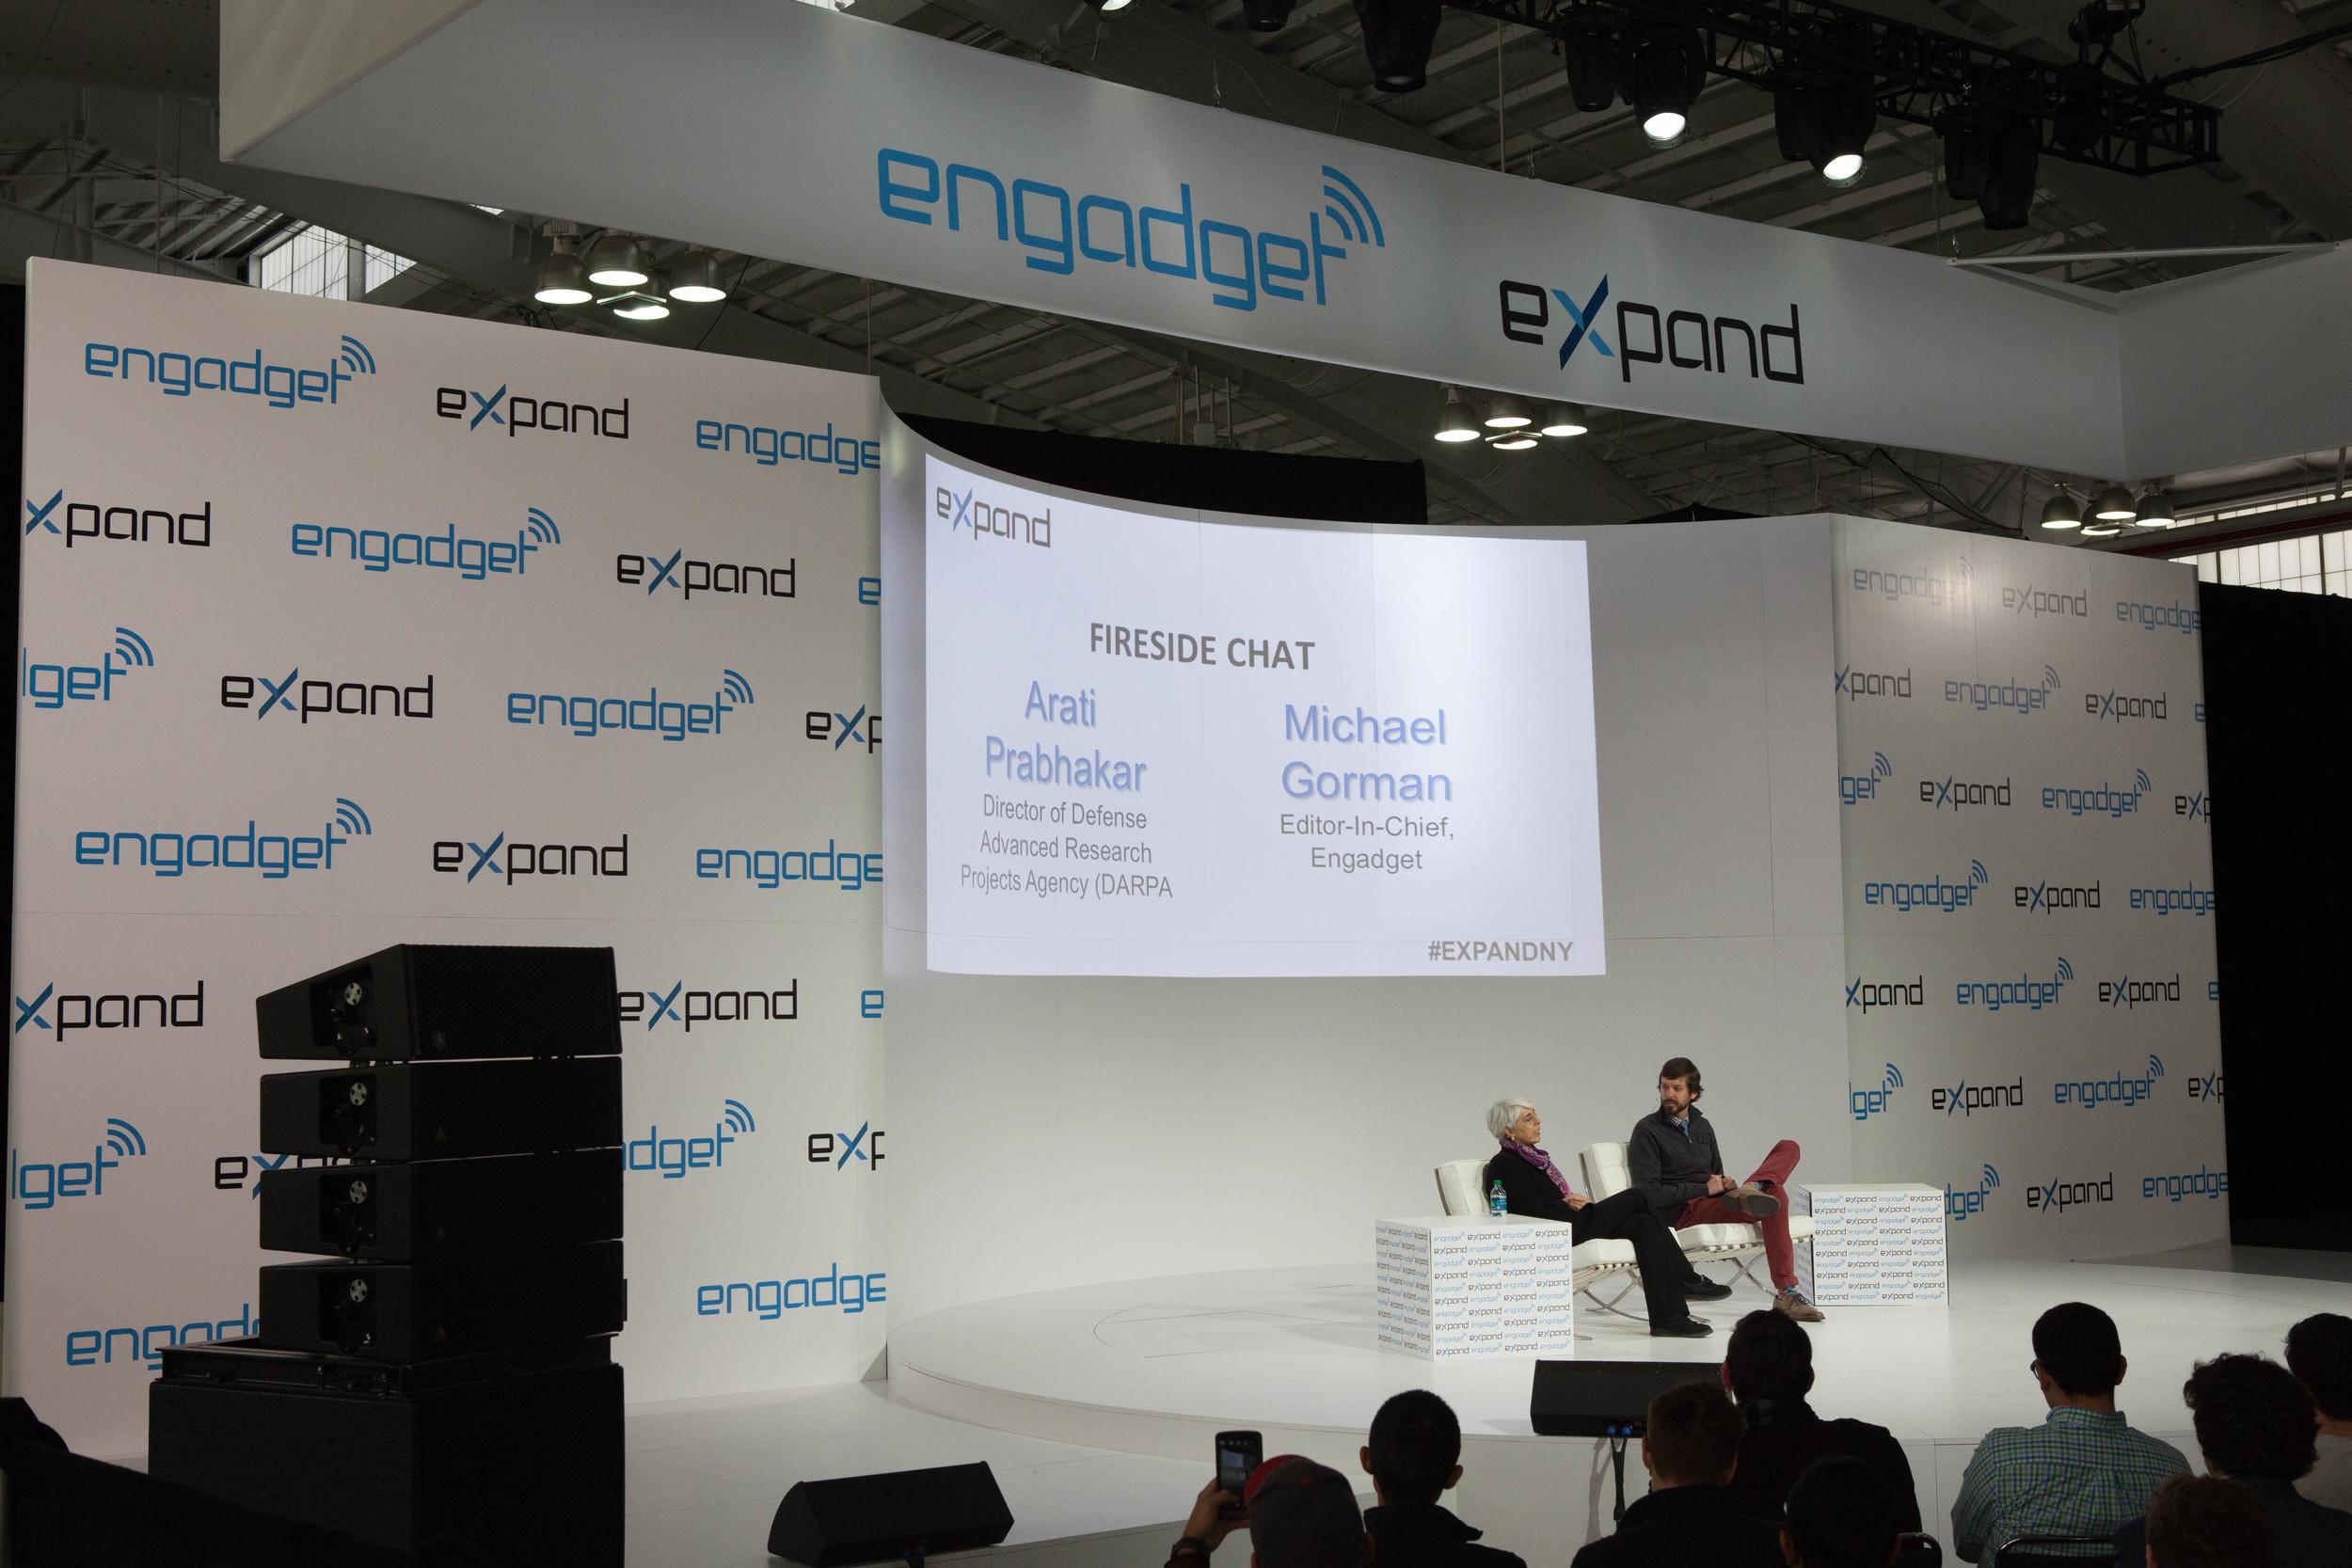 Engadget-2014-029.jpg